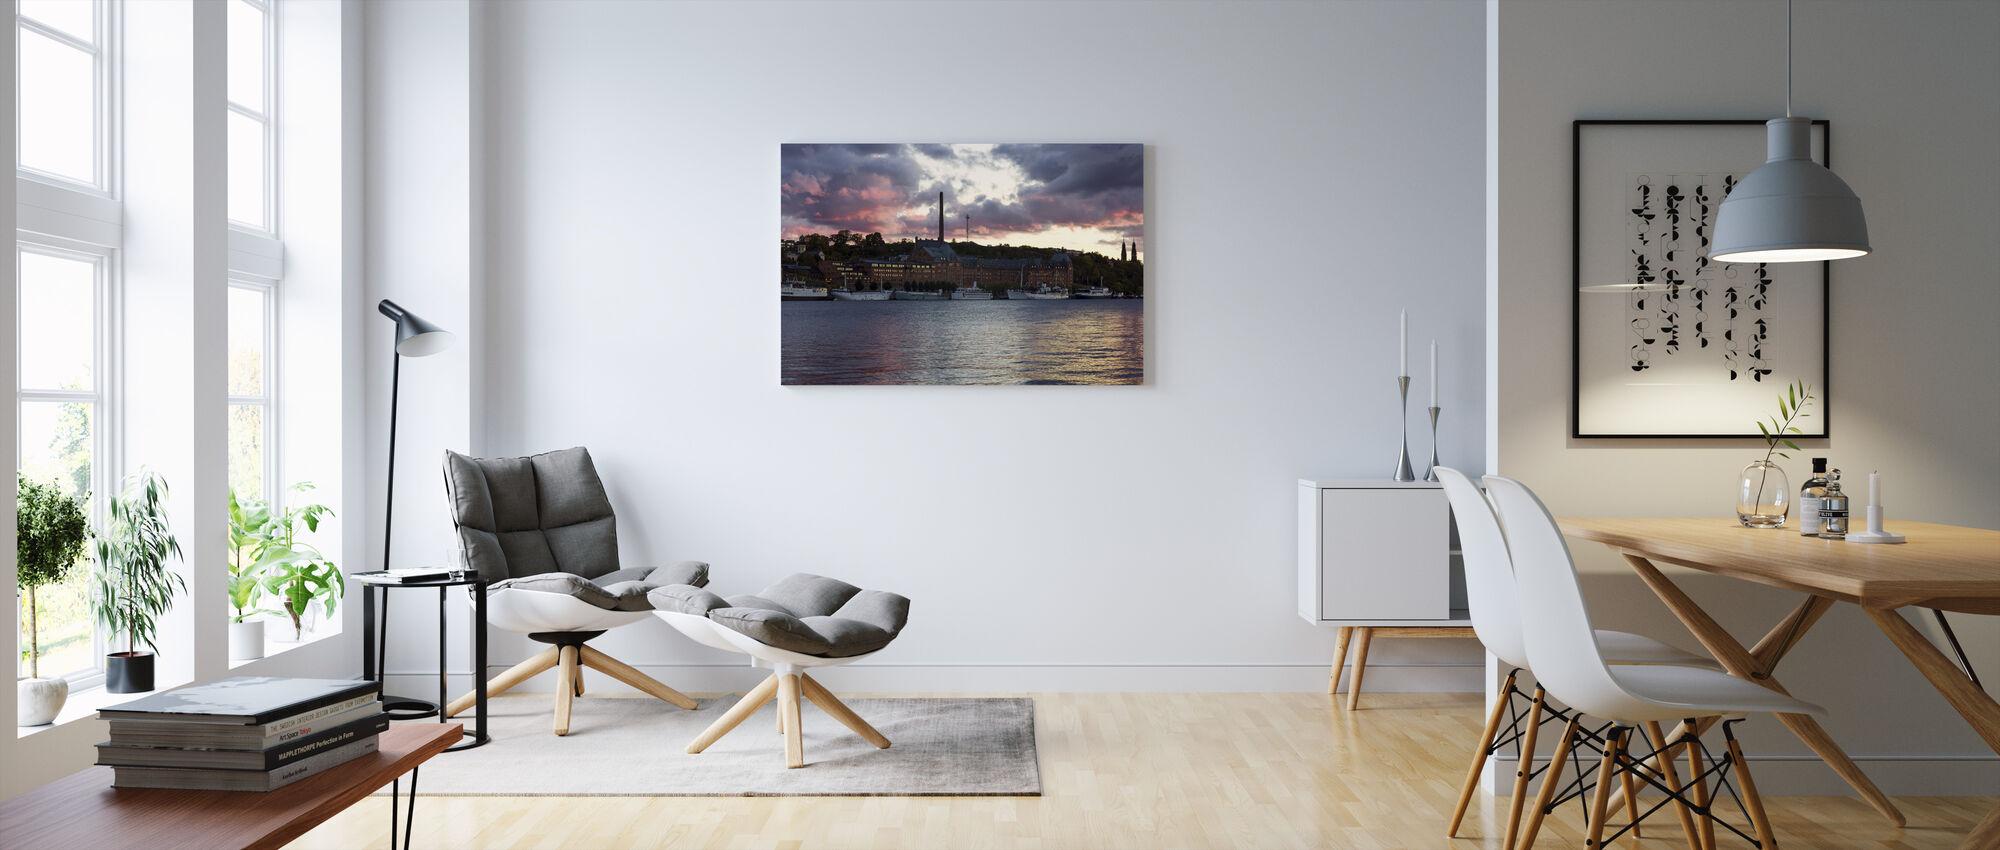 Riddarholmen in Stockholm - Canvas print - Living Room